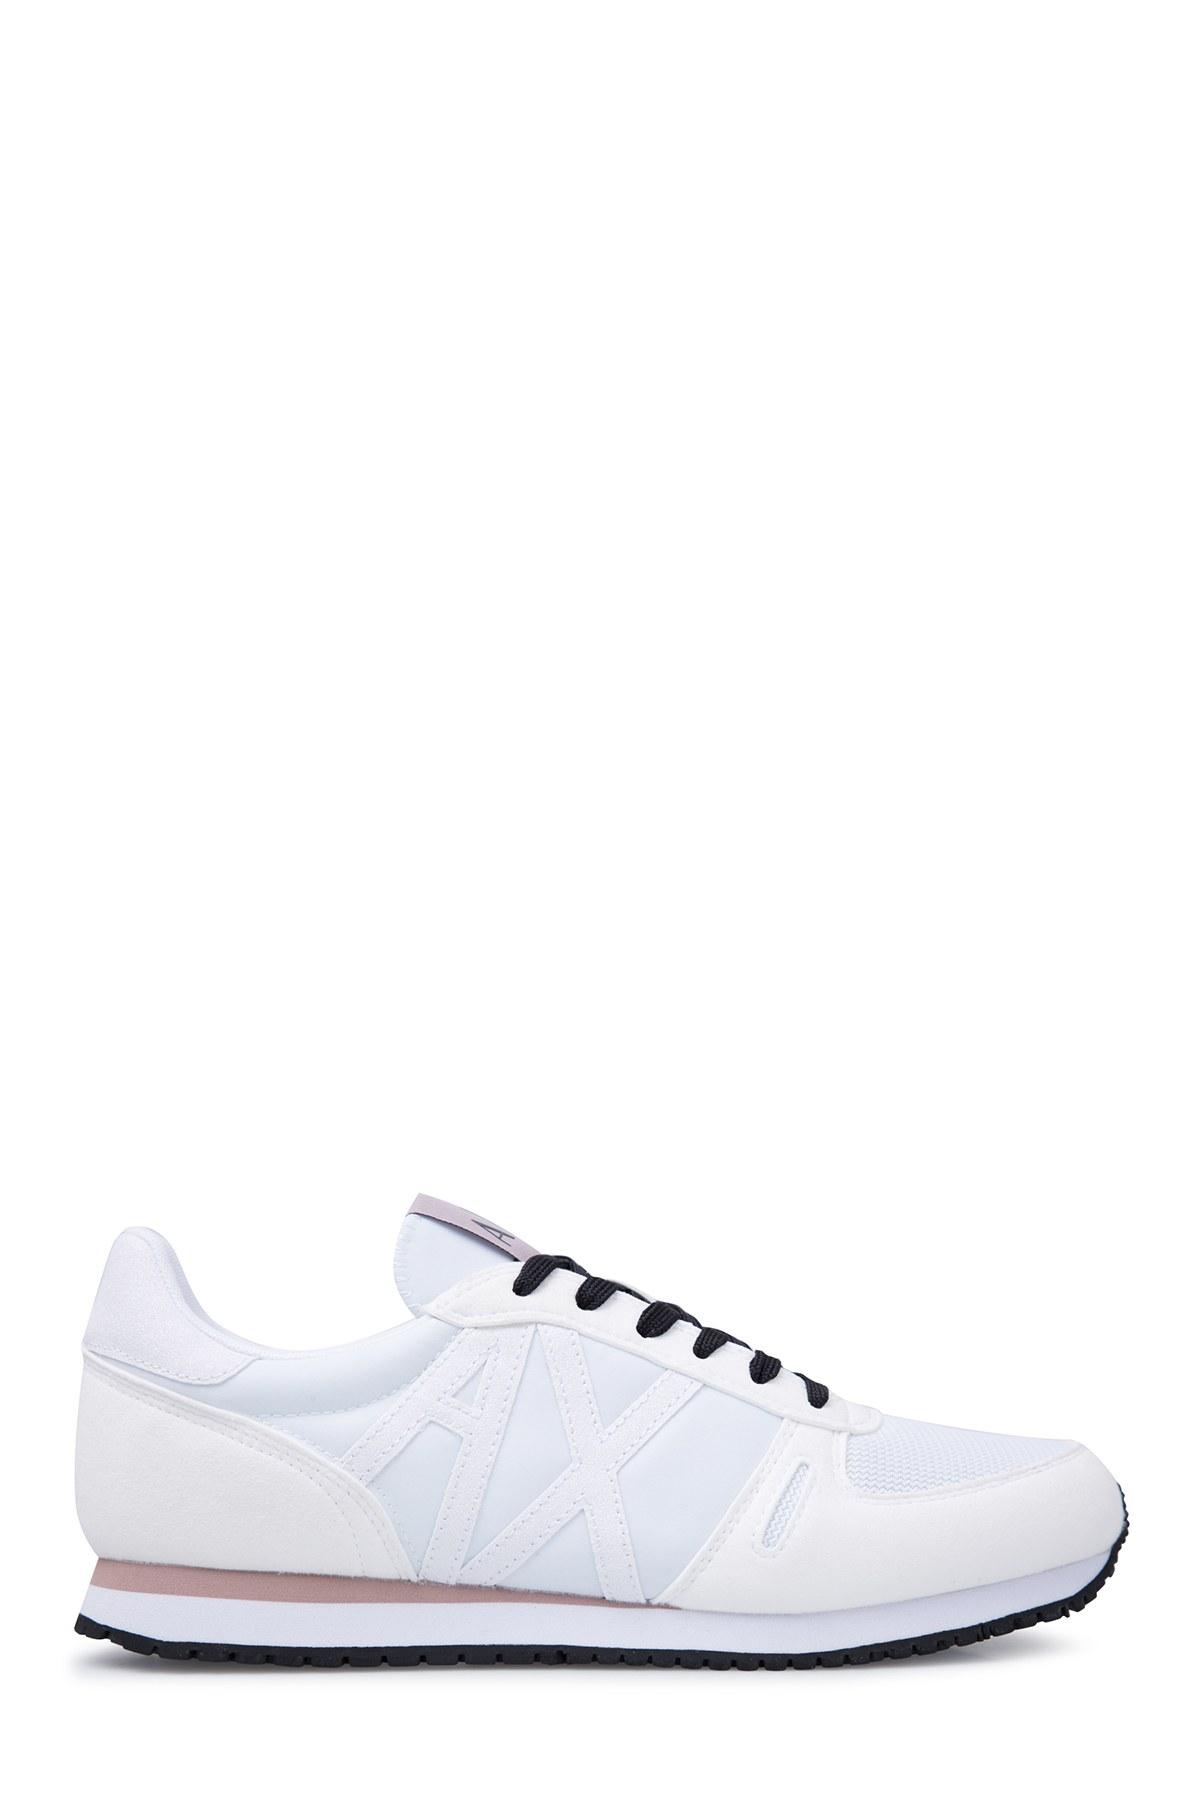 Armani Exchange Bayan Ayakkabı XDX031 XV308 A222 BEYAZ